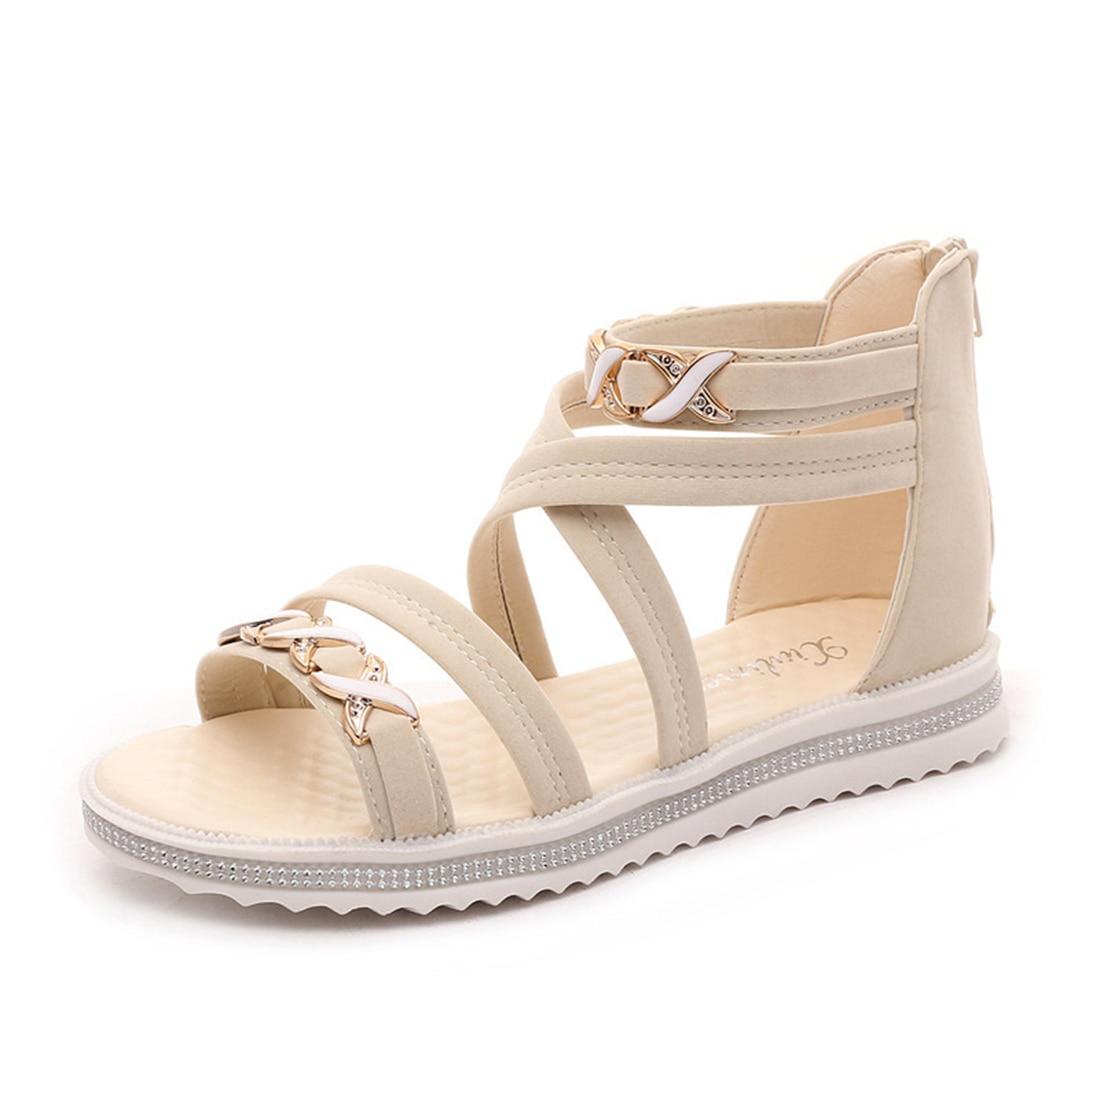 Fantastic Aliexpress.com  Buy 2017 Summer Flat Sandals Women Shoes New Luxury Owl Rhinestone Women ...